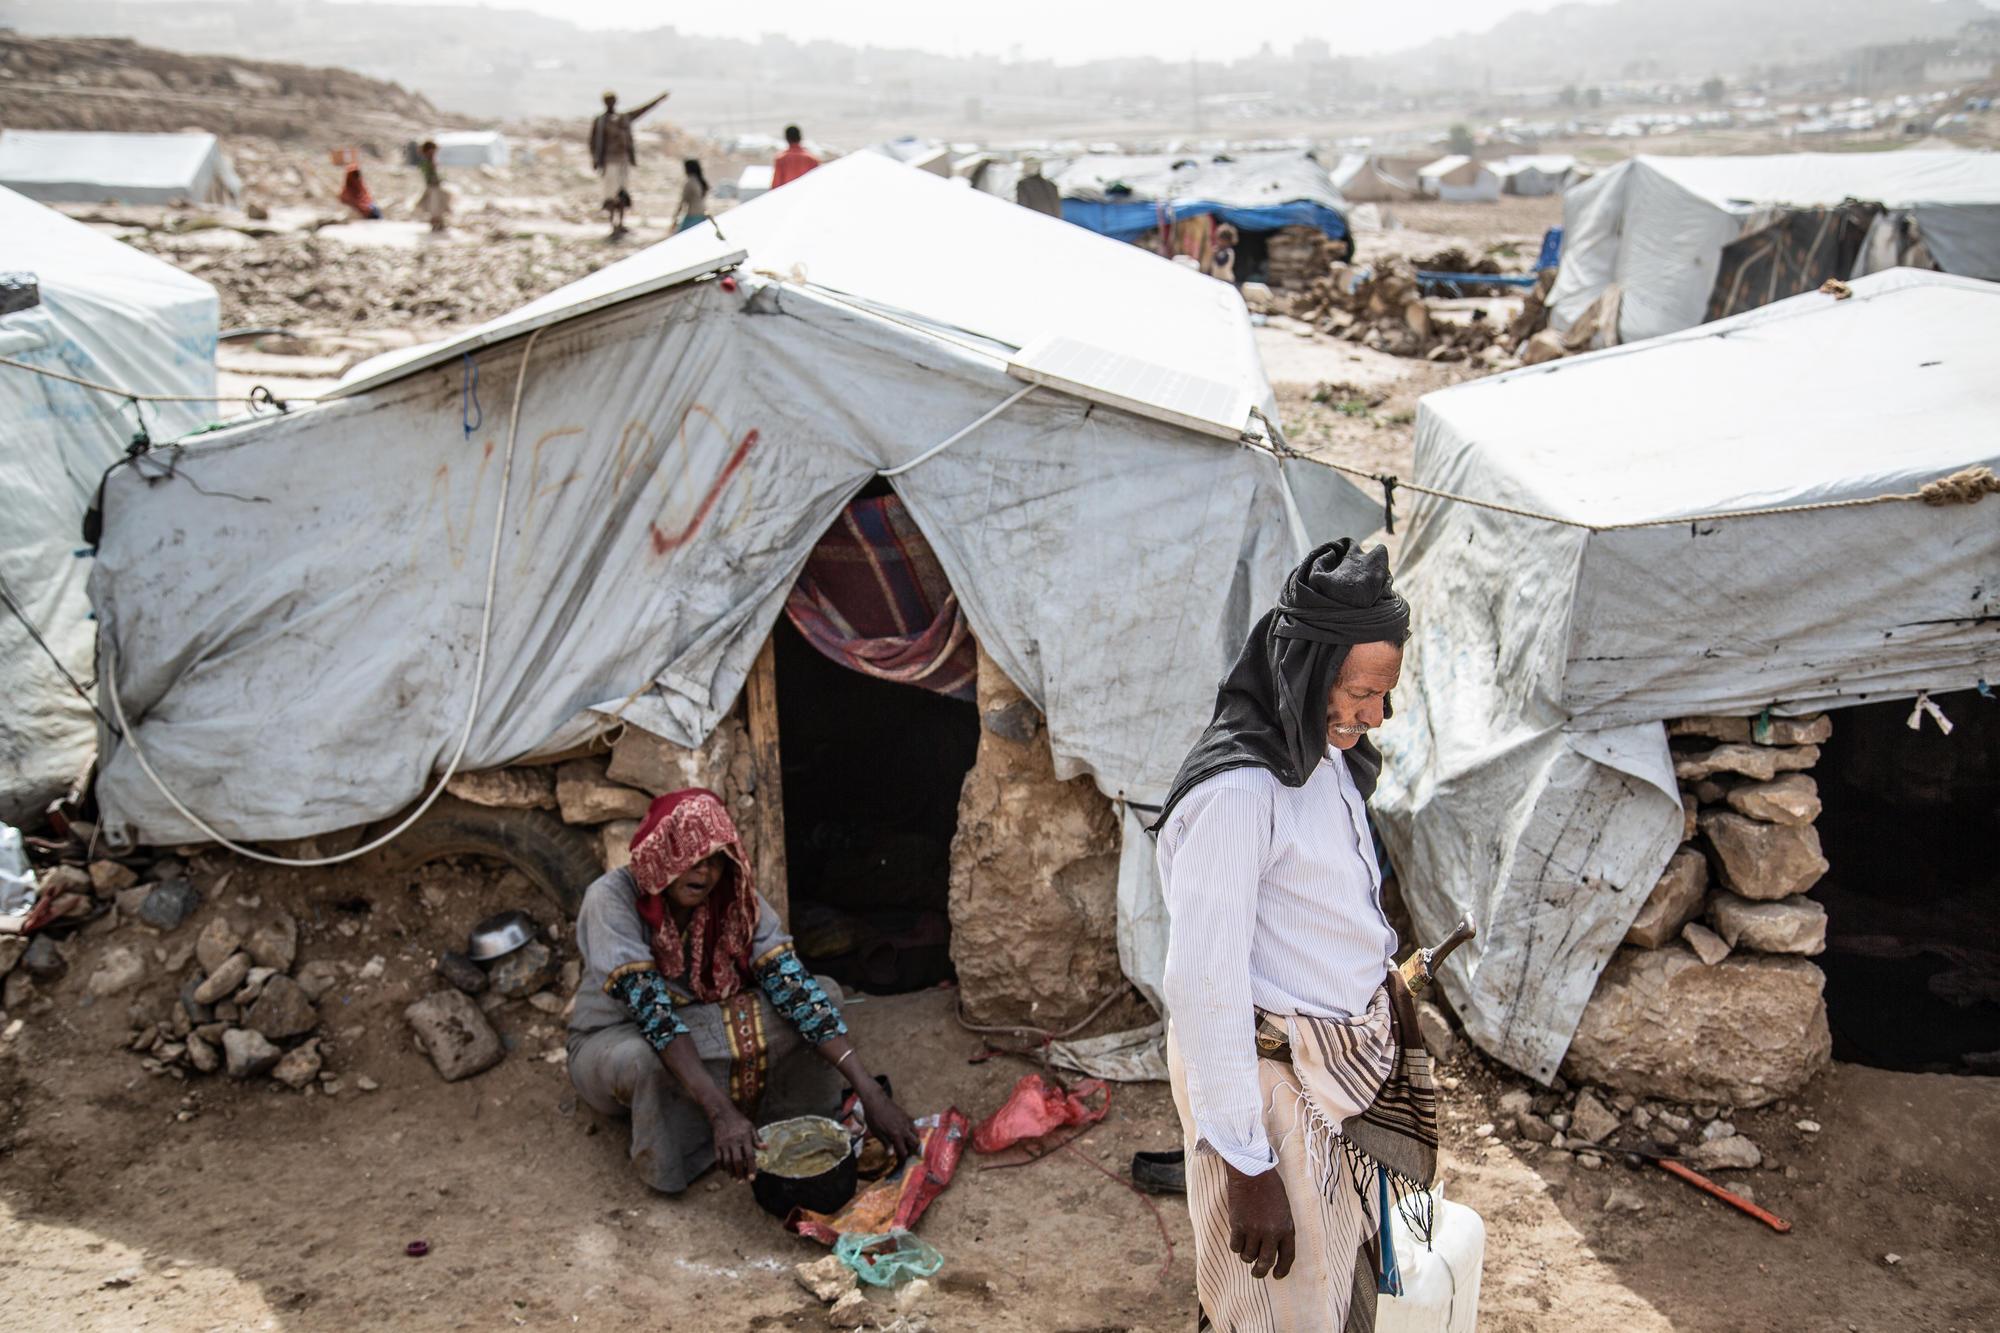 Last stop Khamer: stories of exile in Yemen